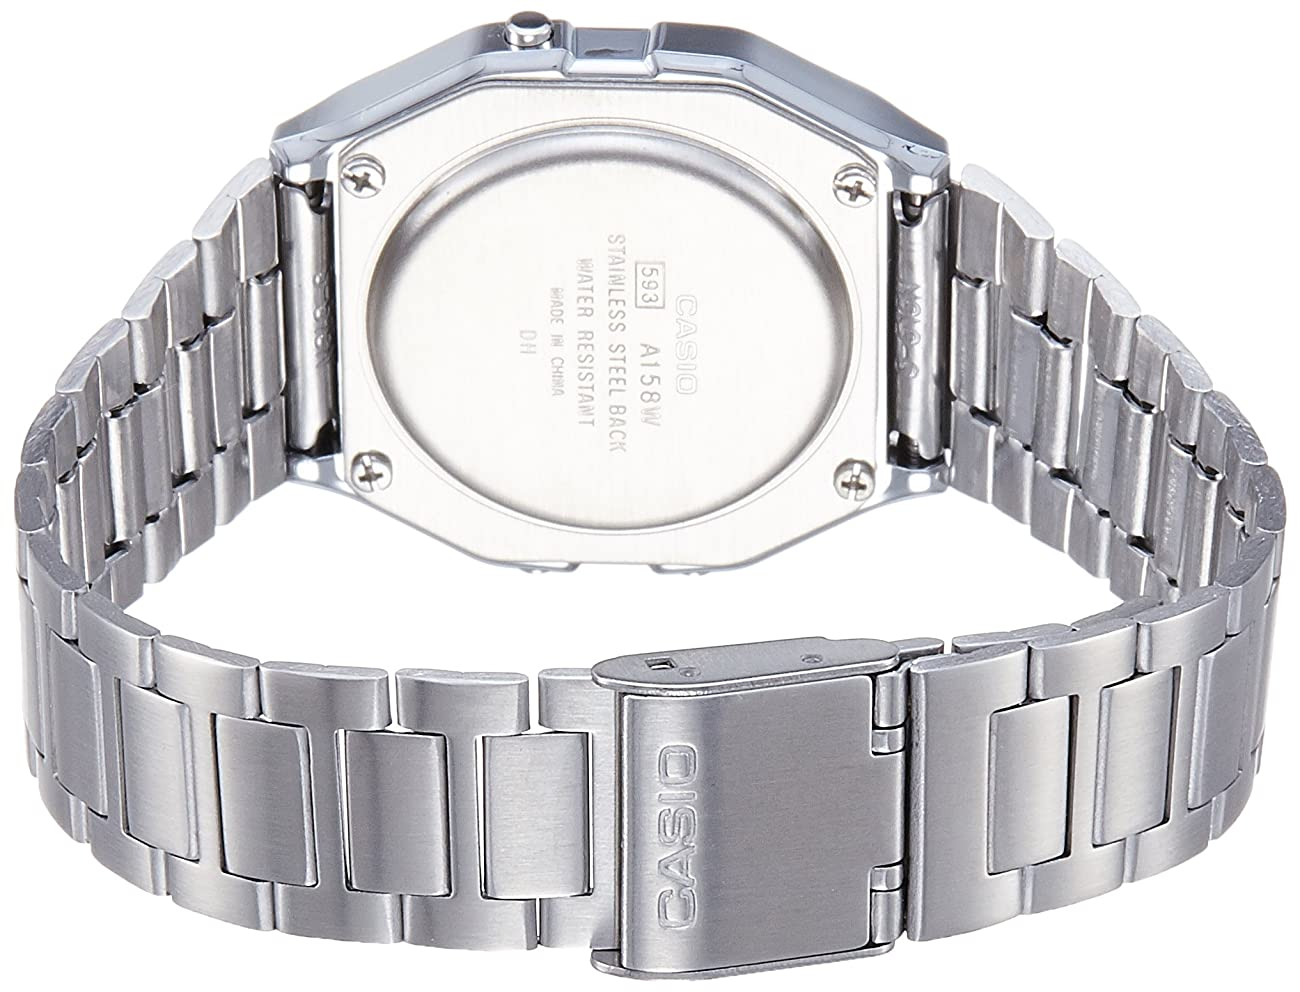 Casio Men'sA158WA-1DF Stainless Steel Digital Watch 1